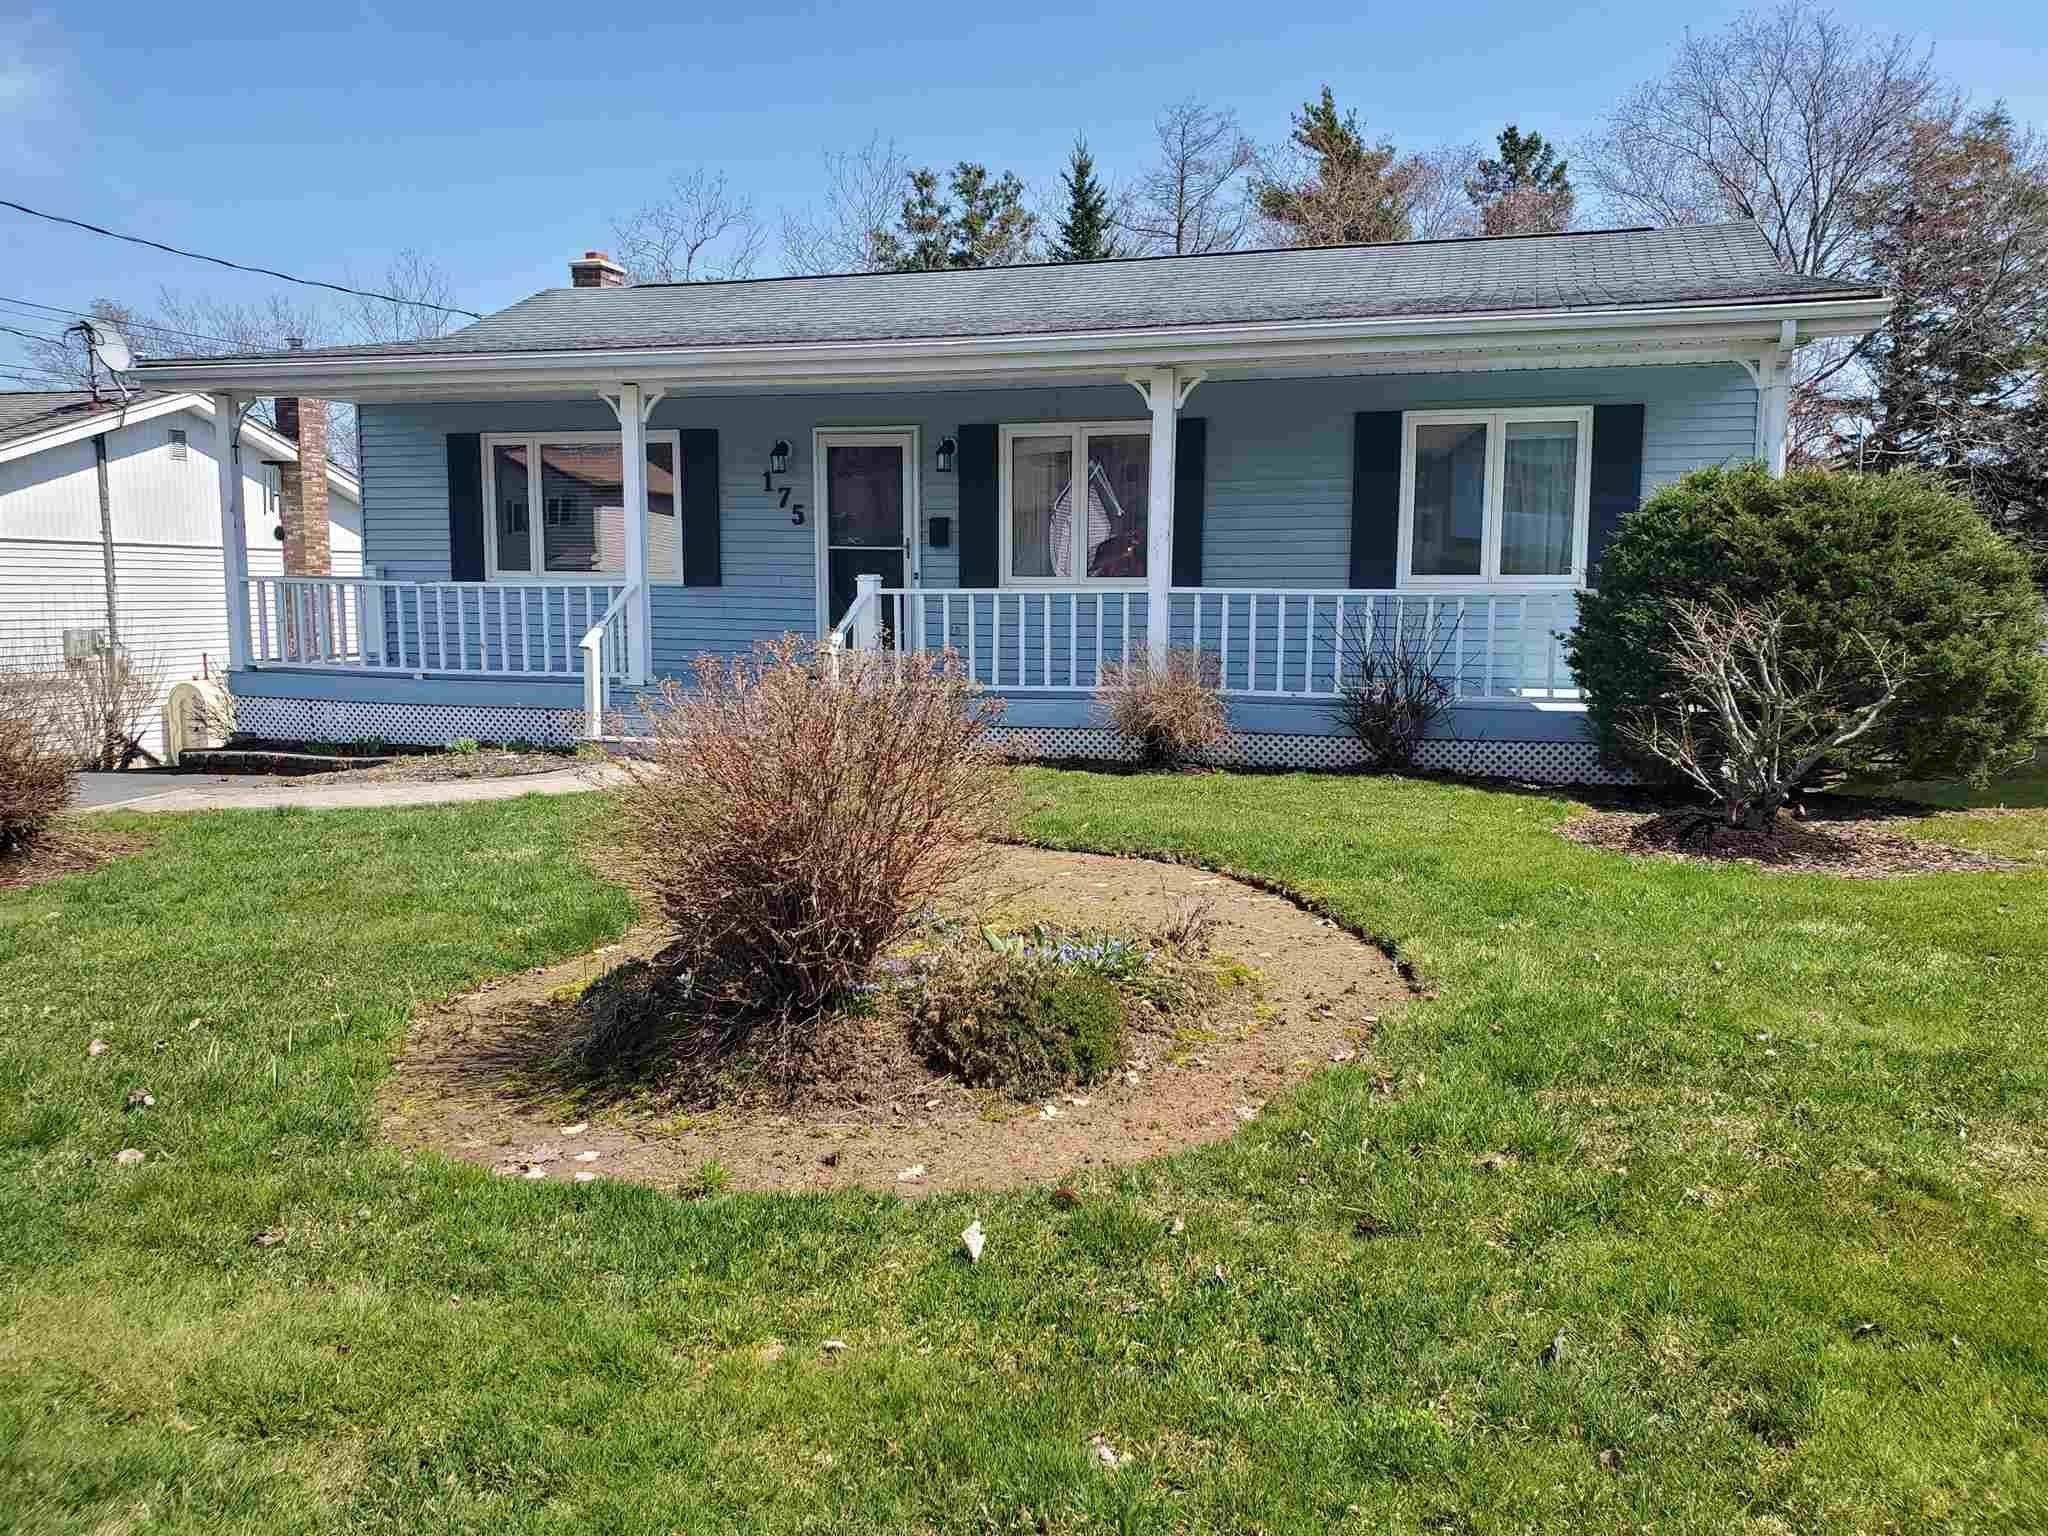 Main Photo: 175 Sunnyvale Crescent in Lower Sackville: 25-Sackville Residential for sale (Halifax-Dartmouth)  : MLS®# 202109588